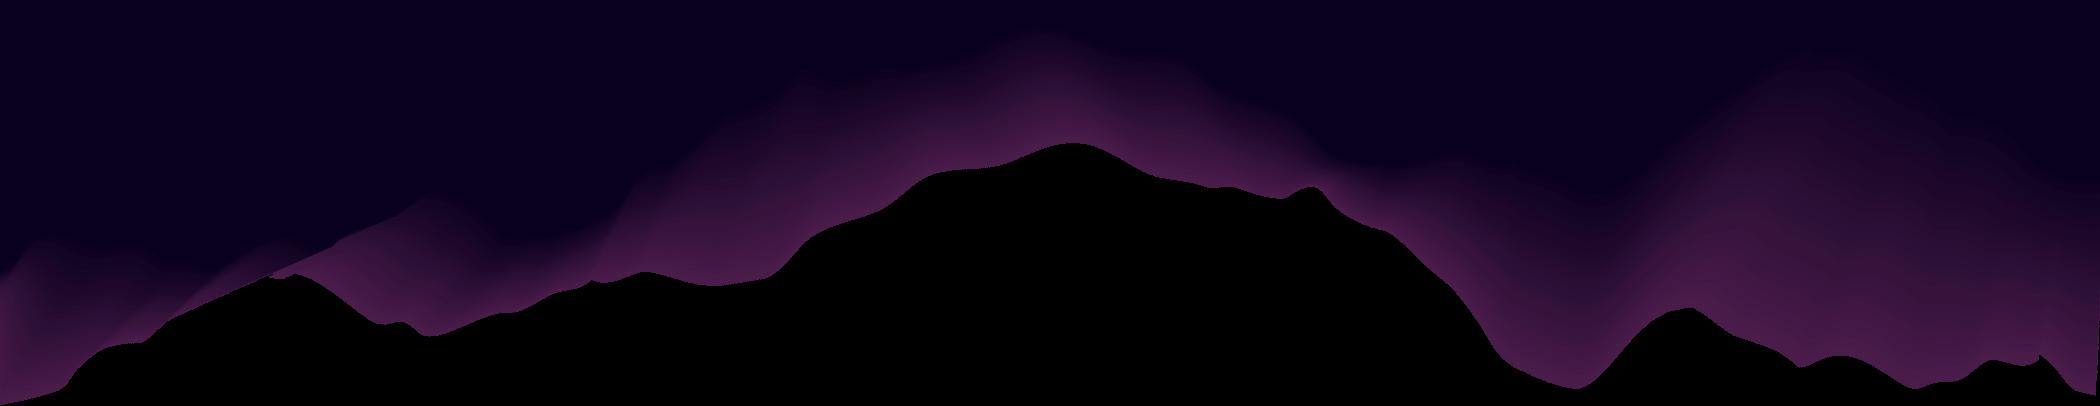 http://www.voyant-medium-africain.fr/wp-content/uploads/2018/05/dark_purple_bottom_divider.png